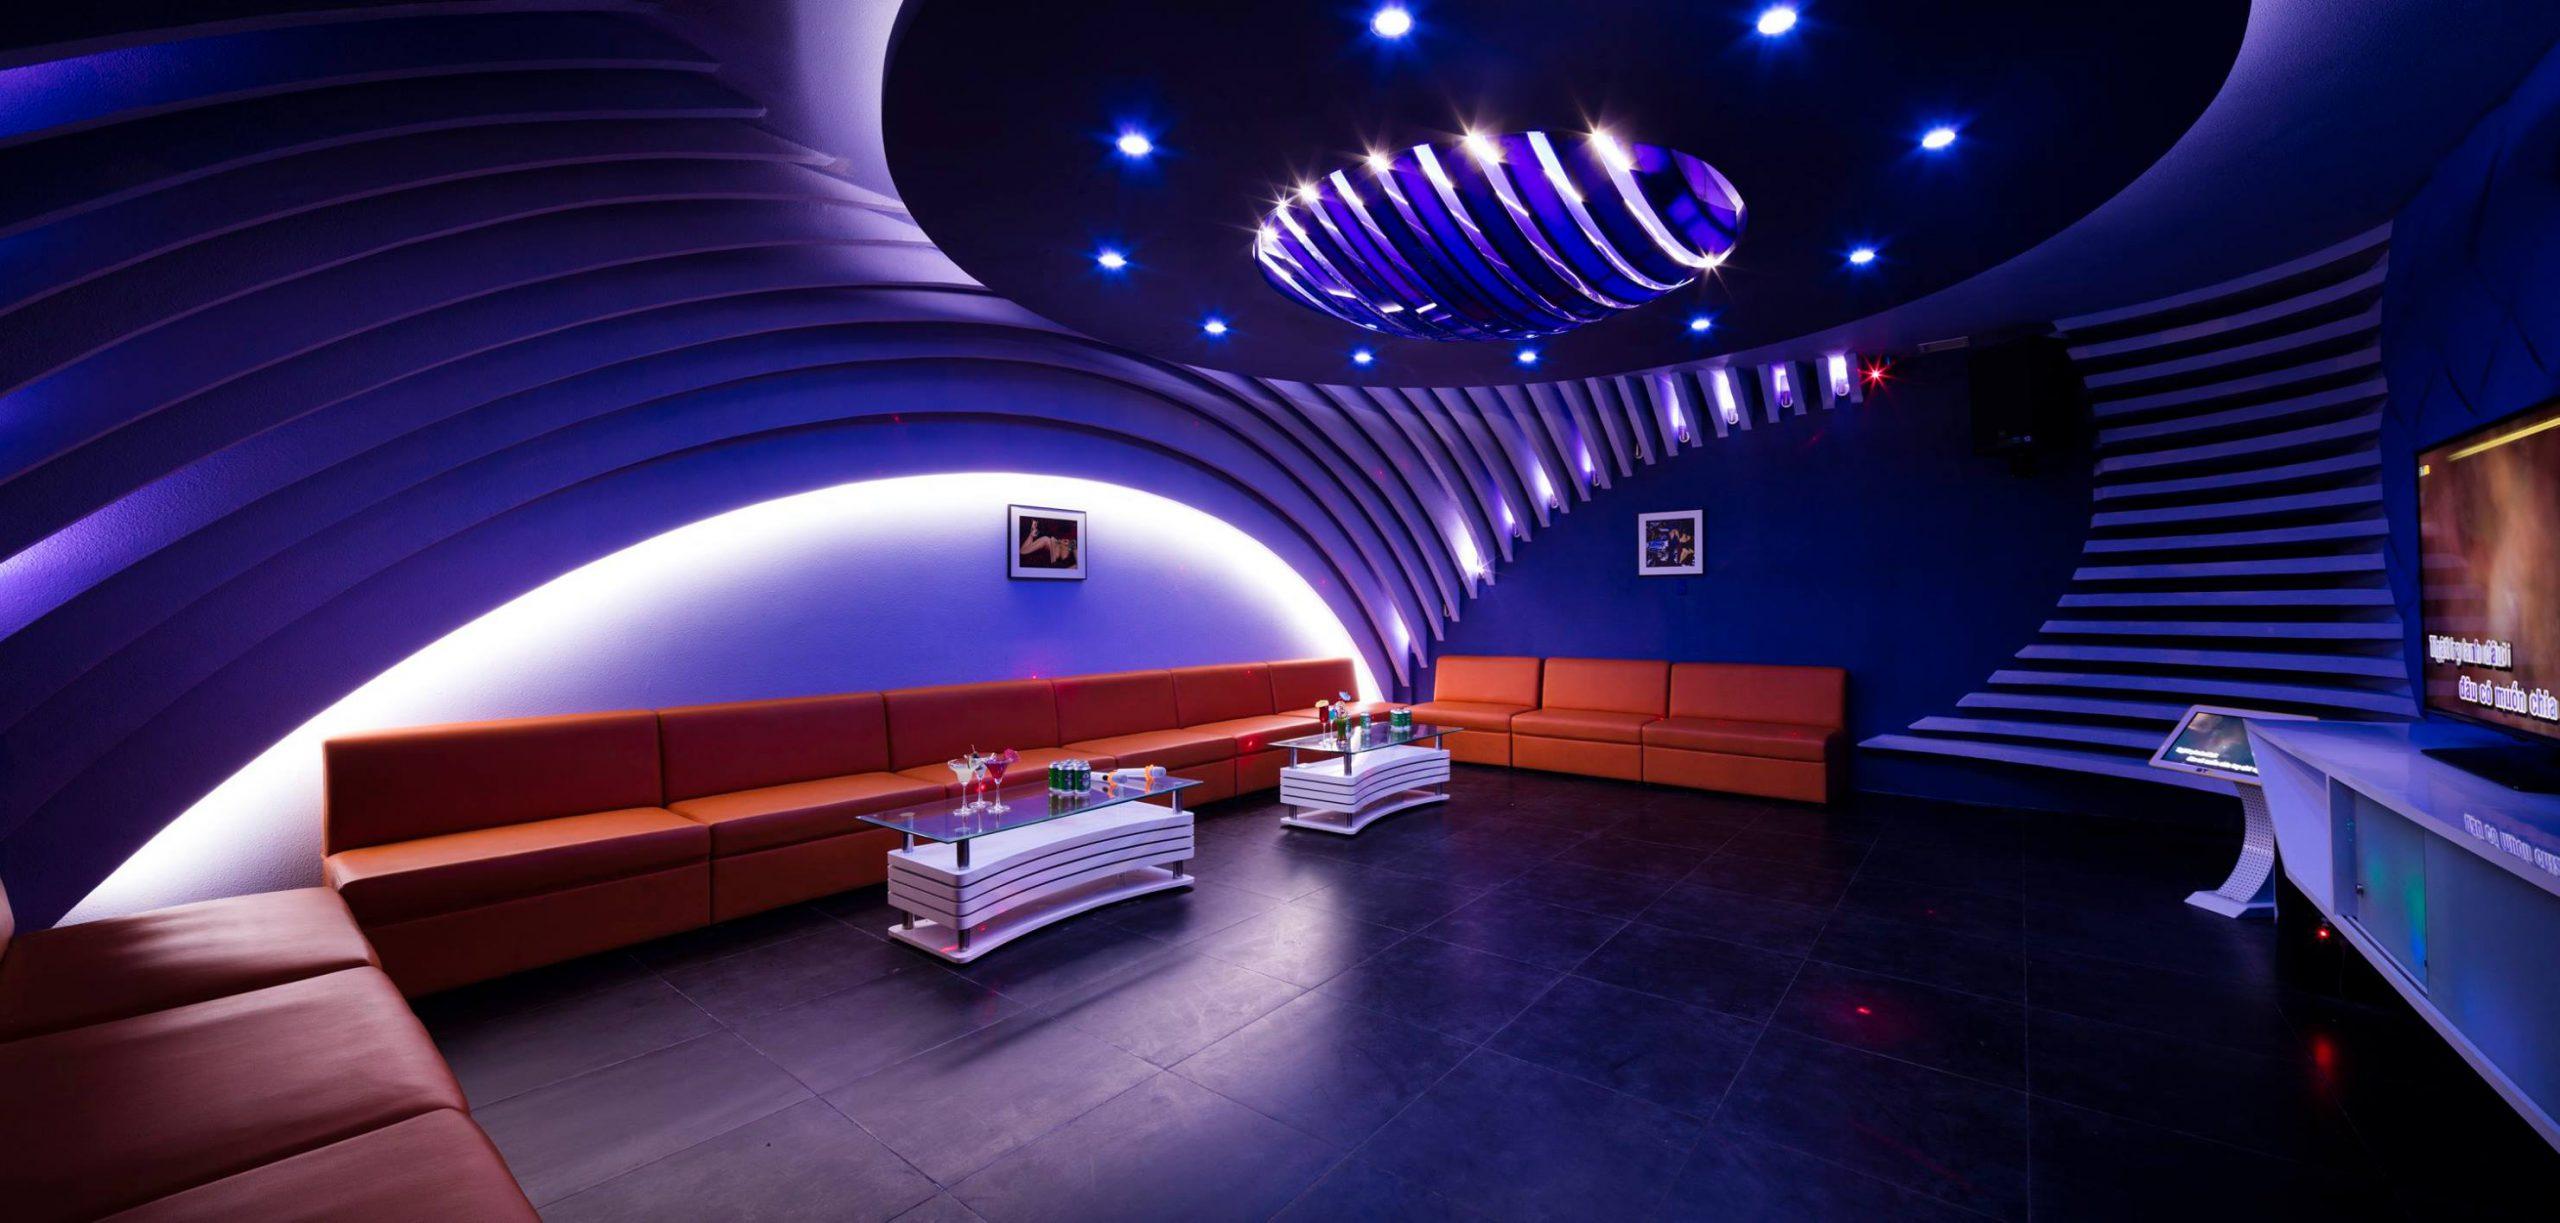 terracotta hotel and resort karaoke